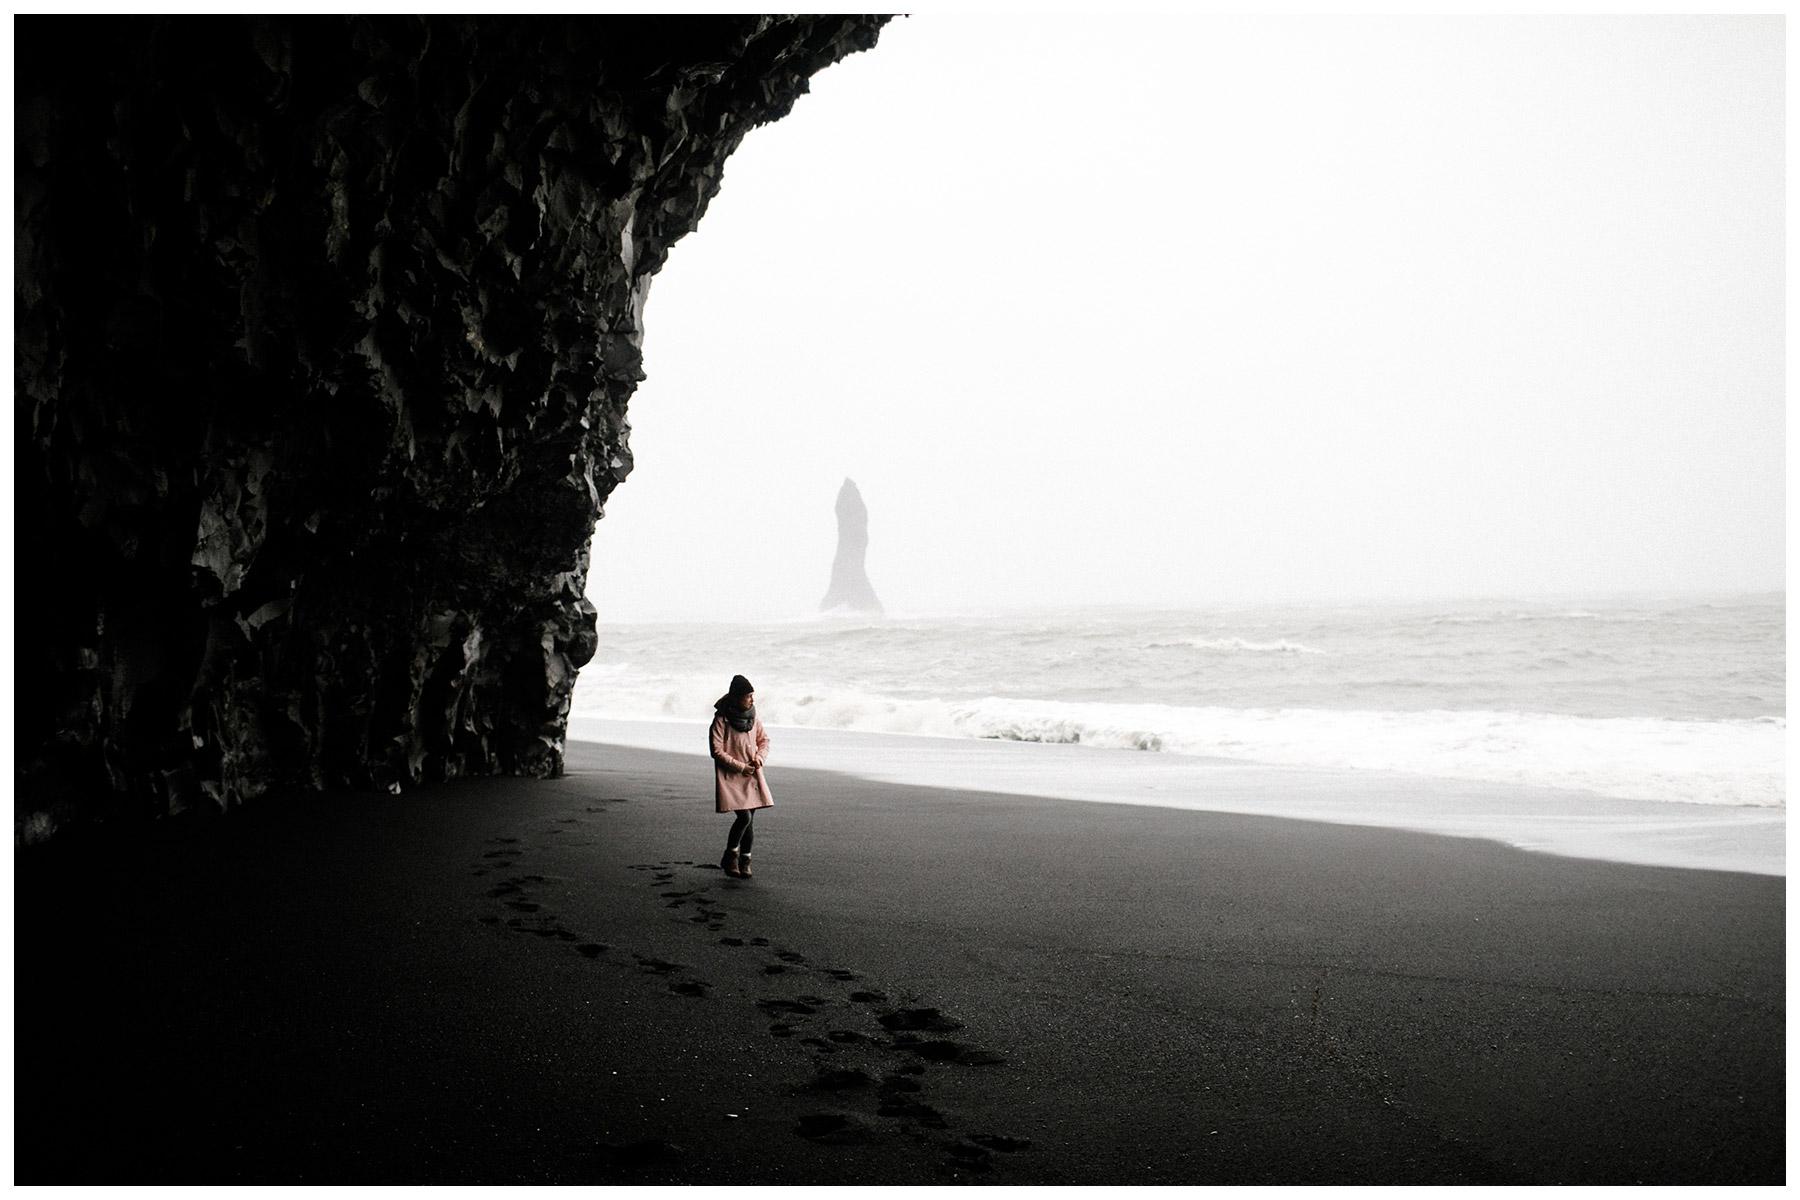 ohhedwig-island-wowair-travel-fotografie_19